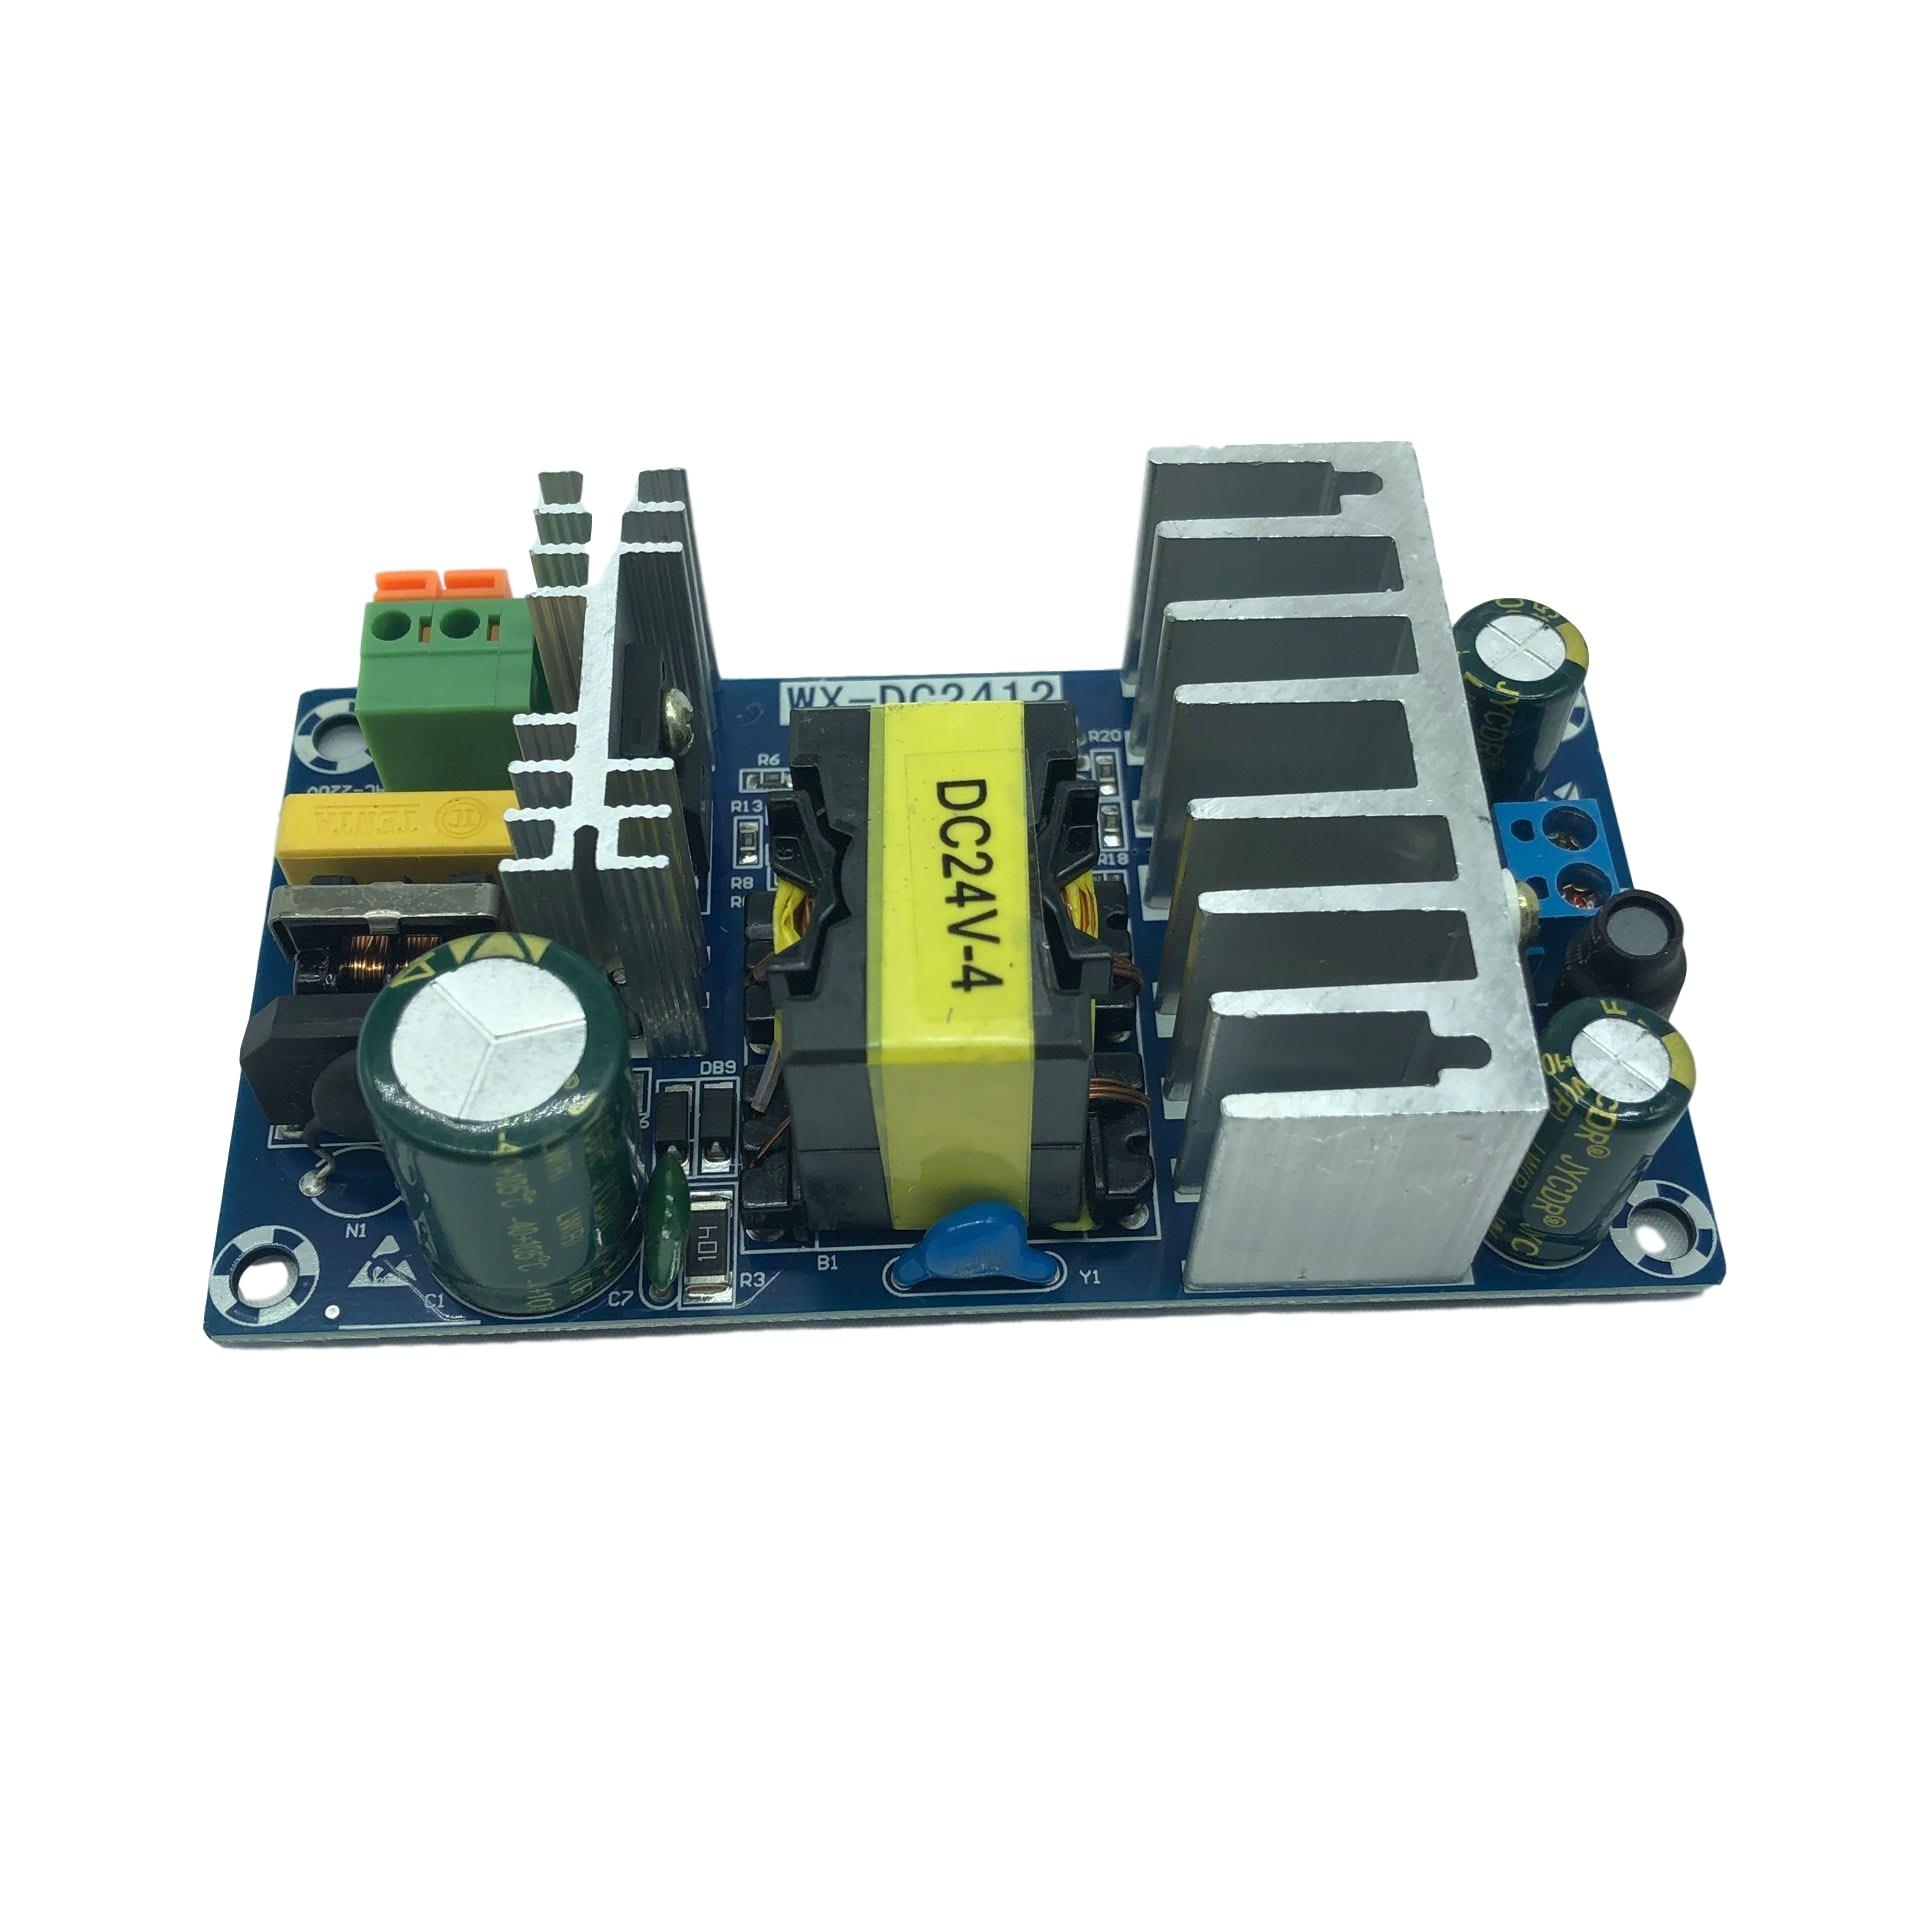 Power Supply Module AC 110v 220v to DC 24V 4A 6A AC-DC Switching Power Supply Board